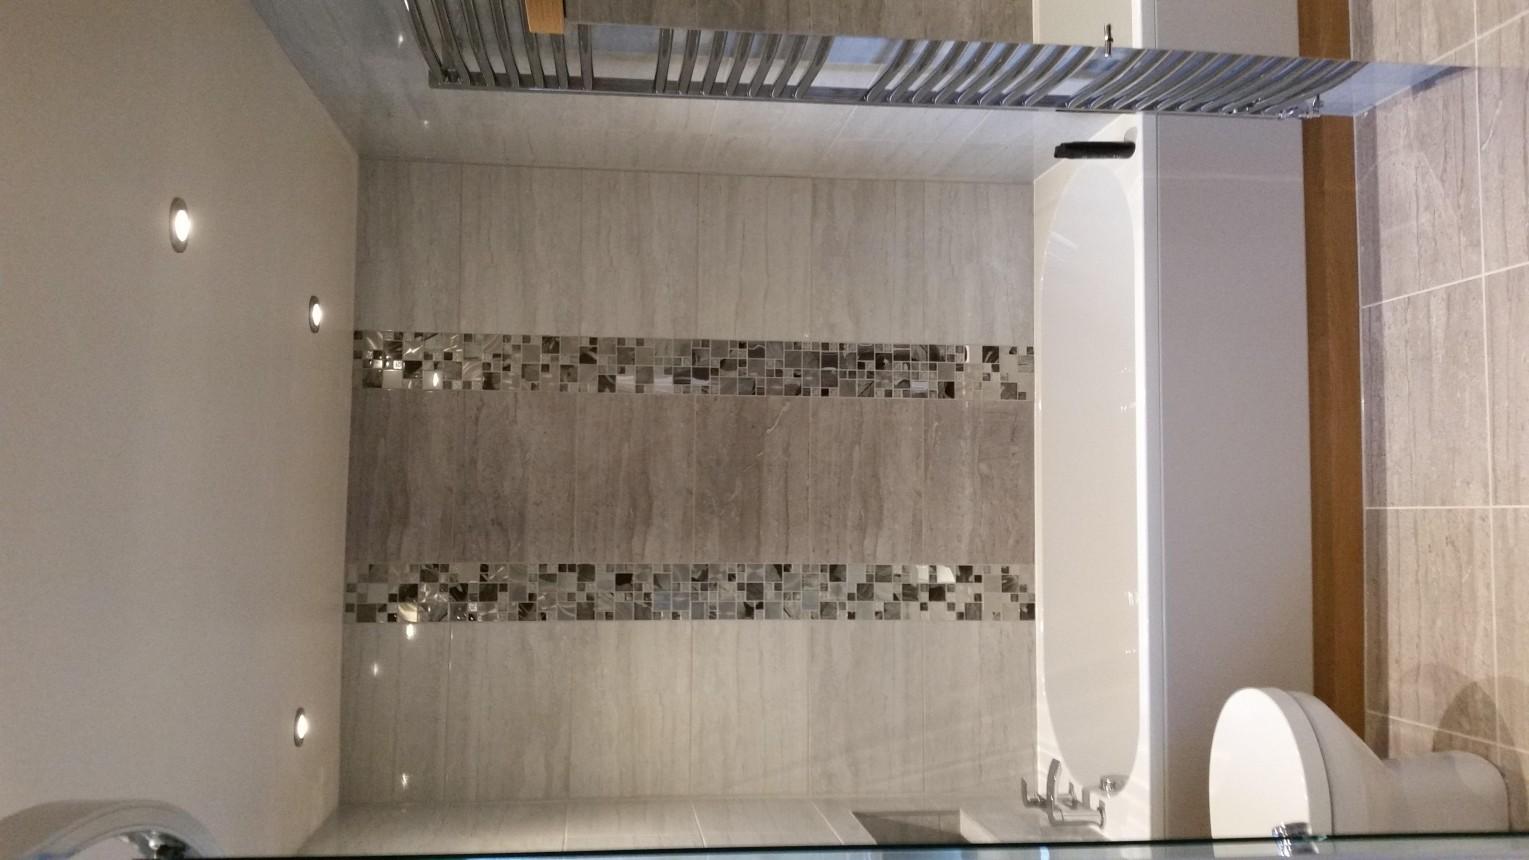 Underfloor heating installations